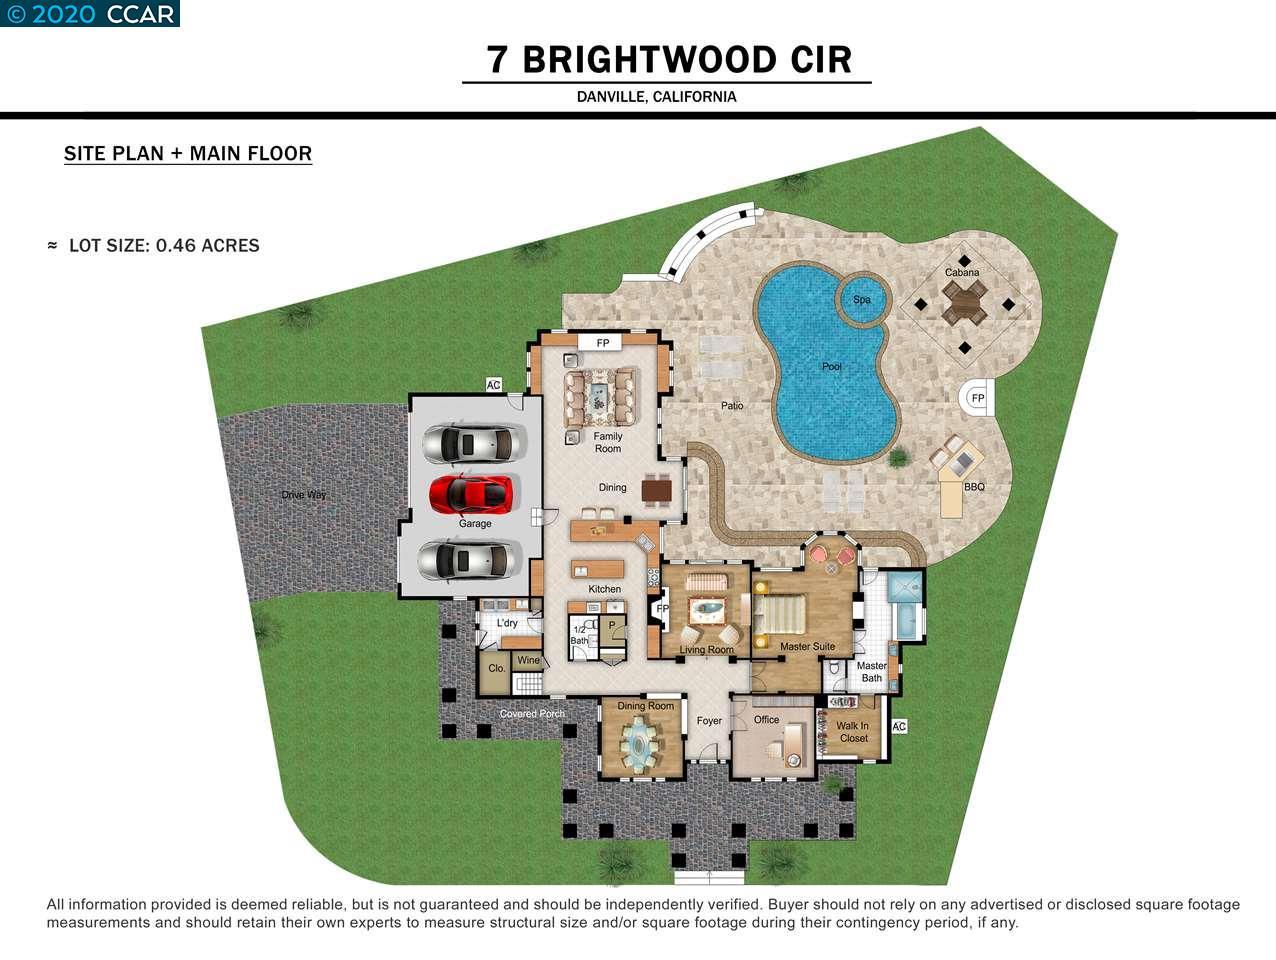 7 Brightwood Cir photo